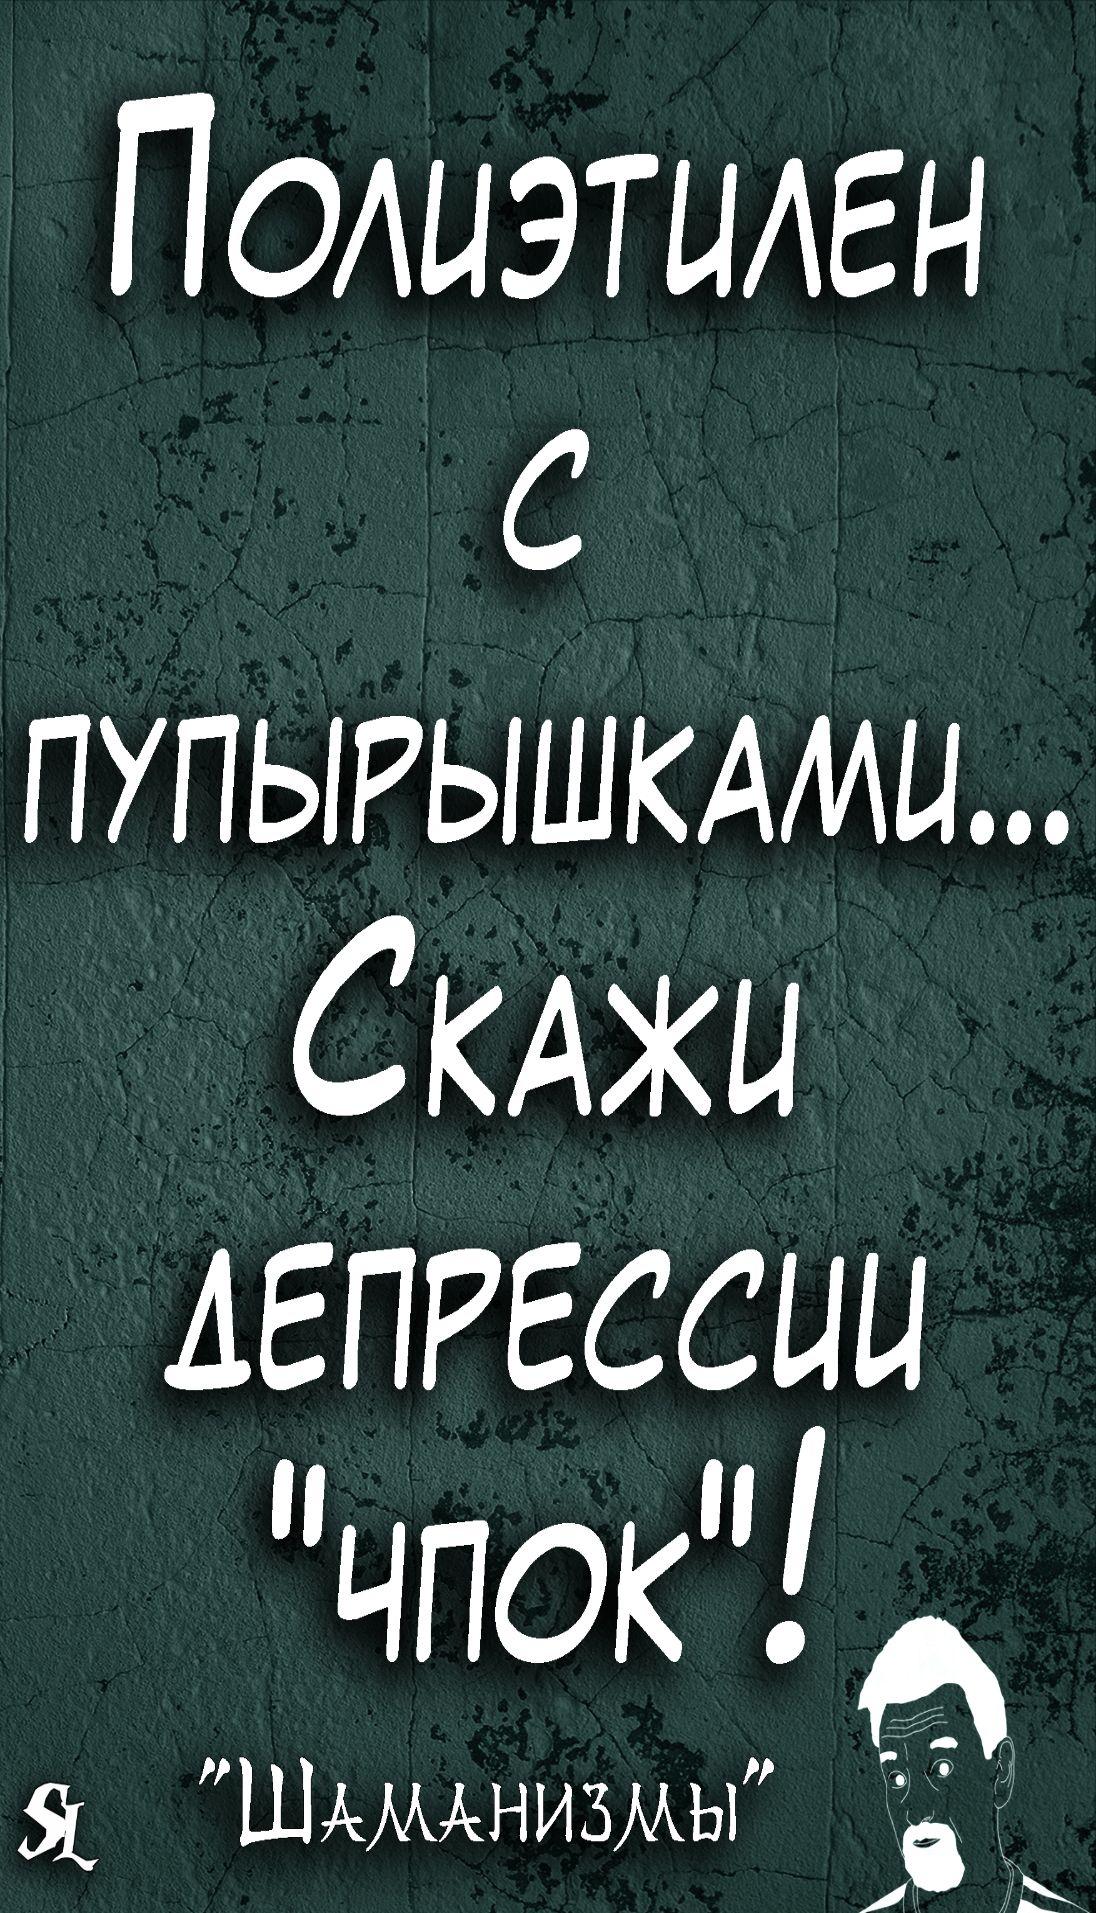 Shamanizmy Shutki Prikol Yumor Jokes Funny Humor Memes Shaman Ledentsov Sl Shaman Ledentsov Quotations Jokes Humor